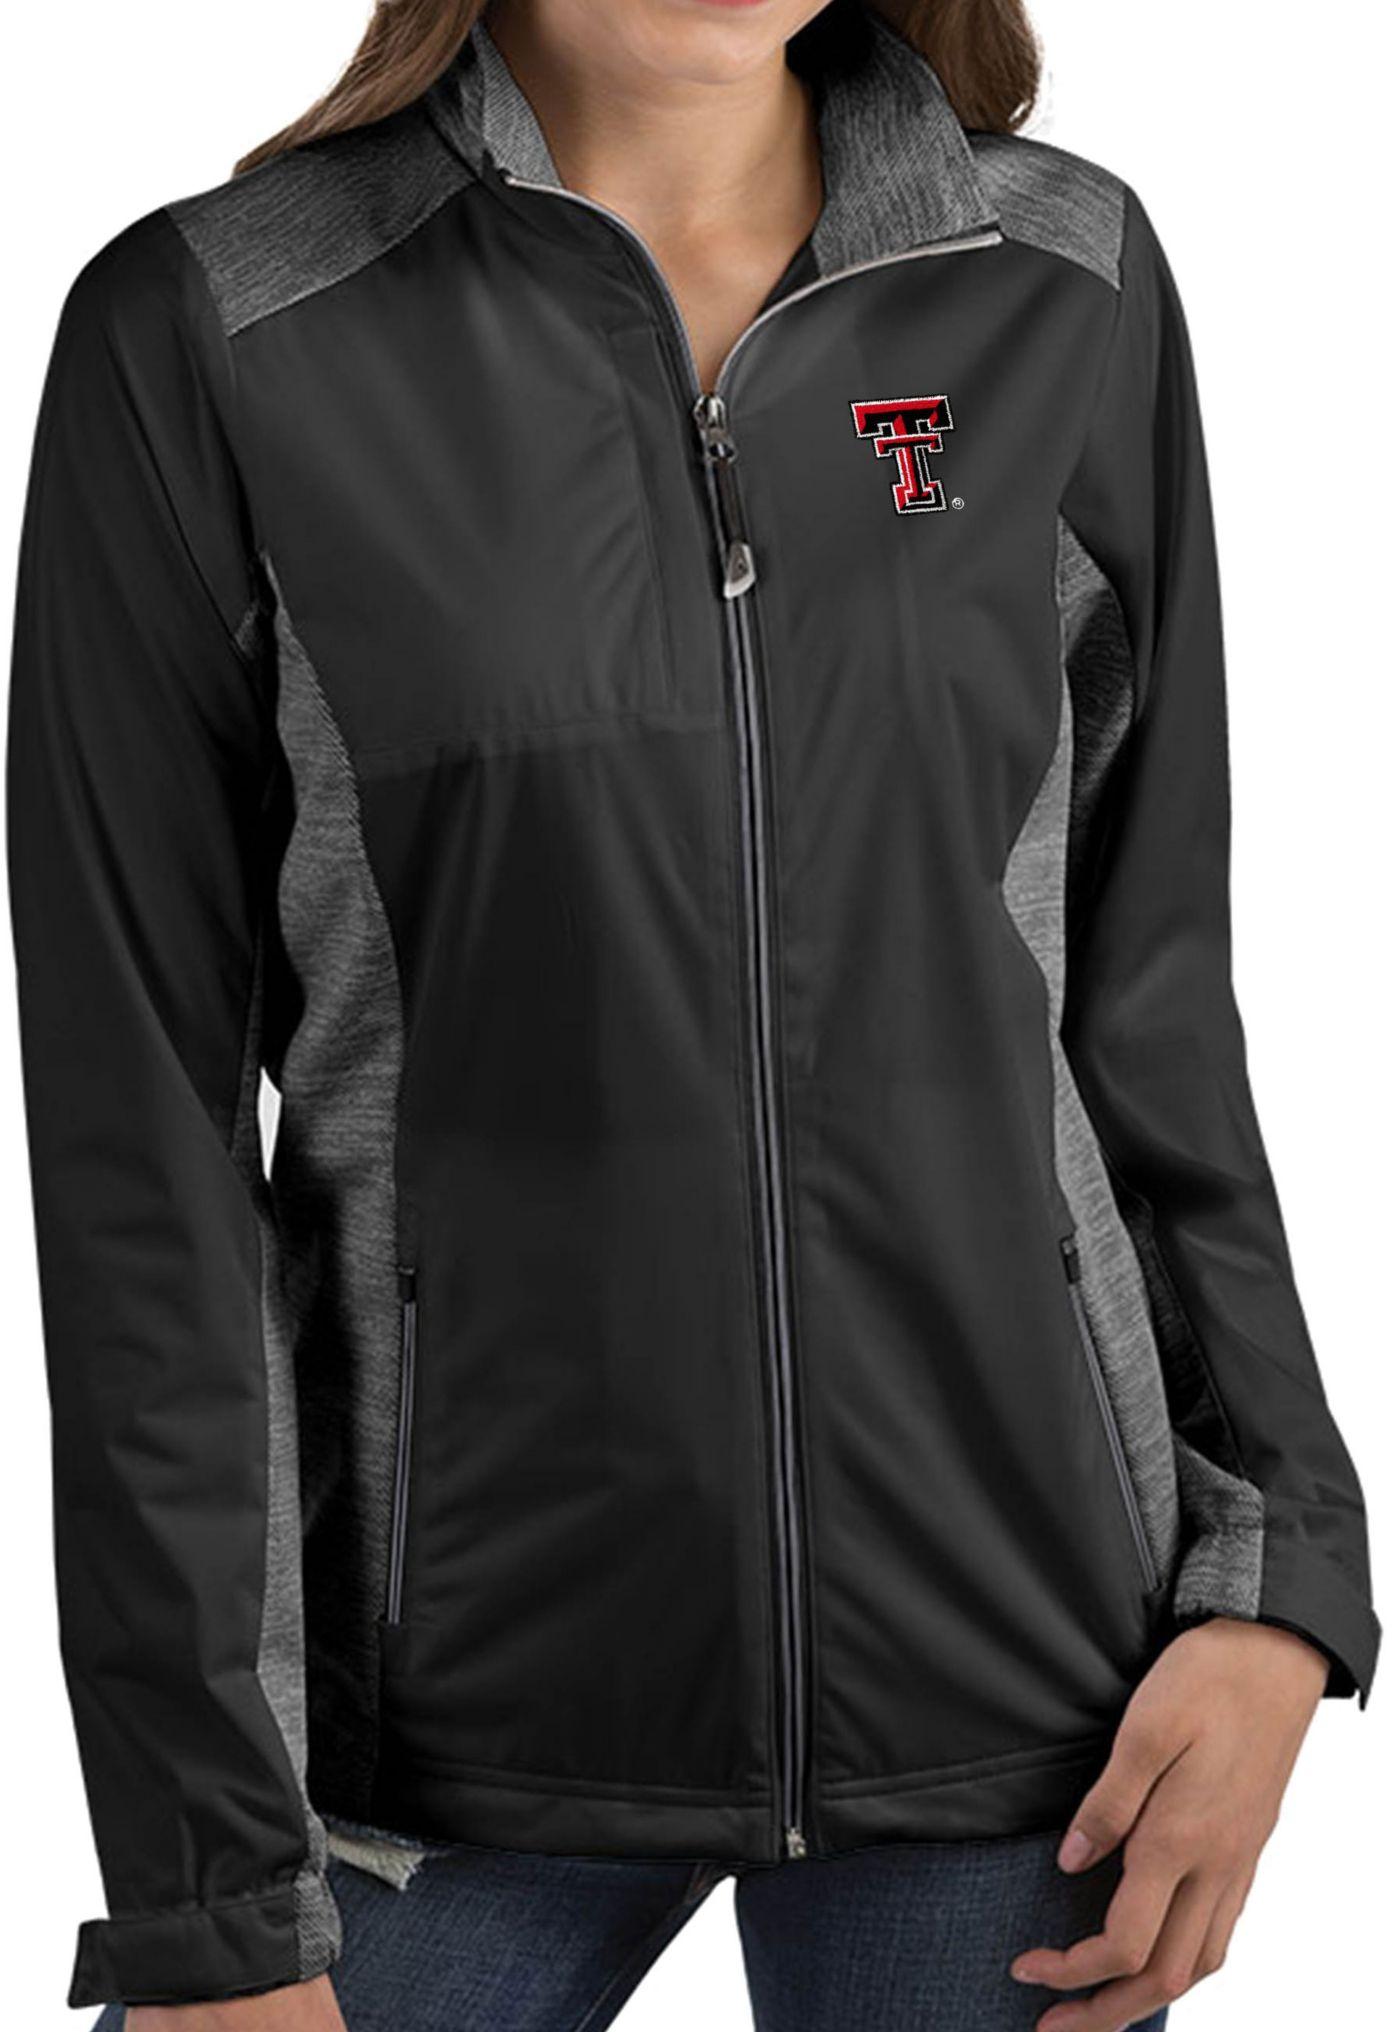 Antigua Women's Texas Tech Red Raiders Revolve Full-Zip Black Jacket